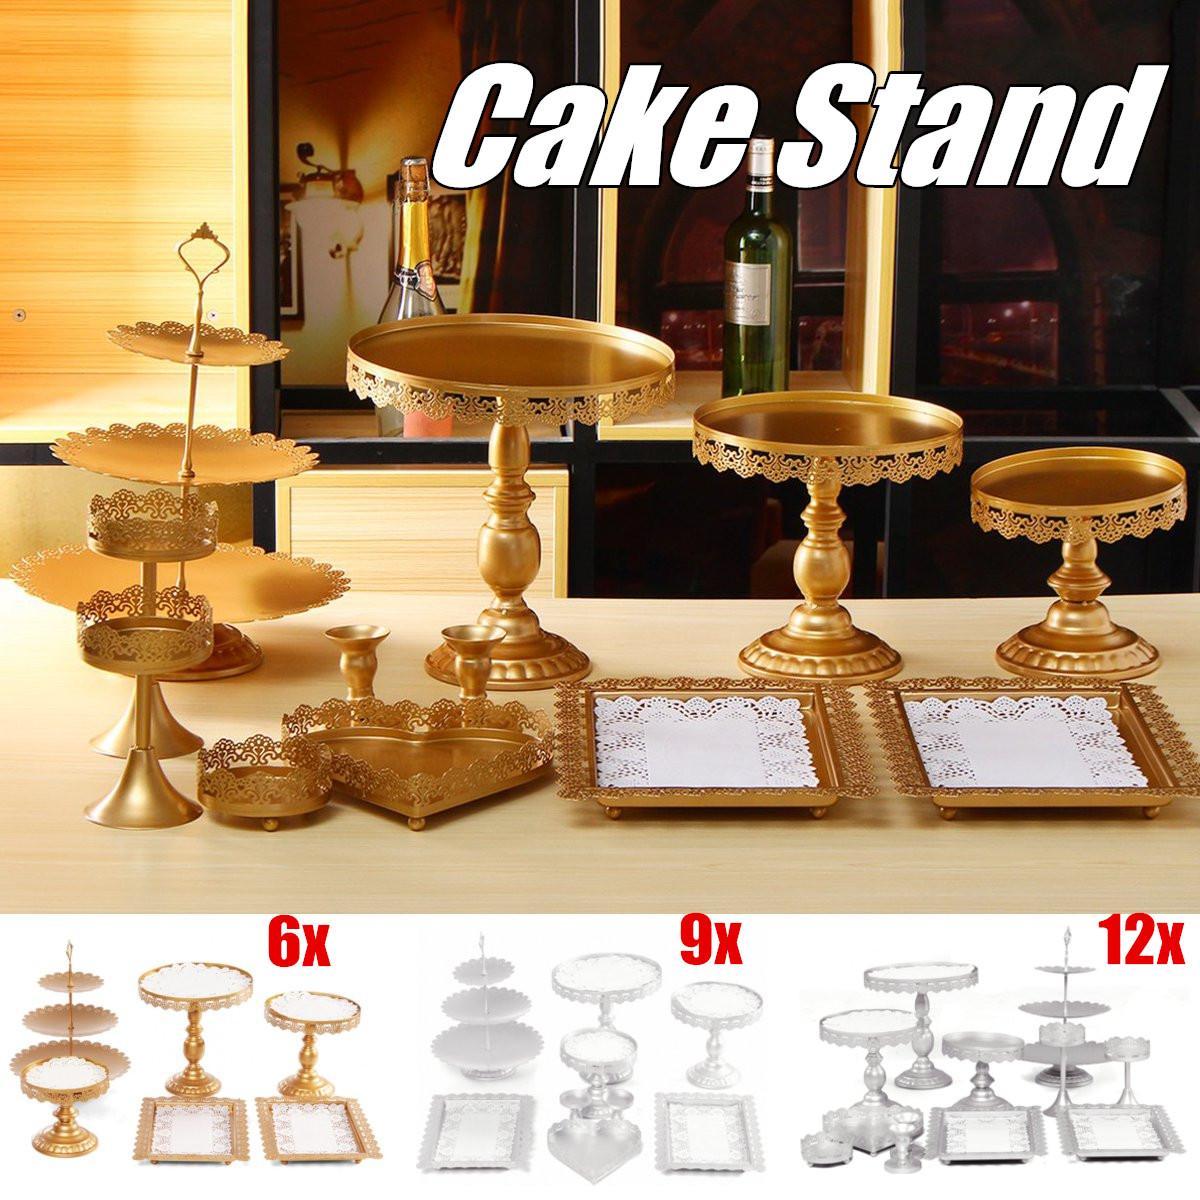 6 9 12Pcs Iron White Gold Cupcake Stand Metal Cake Stand Holder Tray Birthday Wedding Party